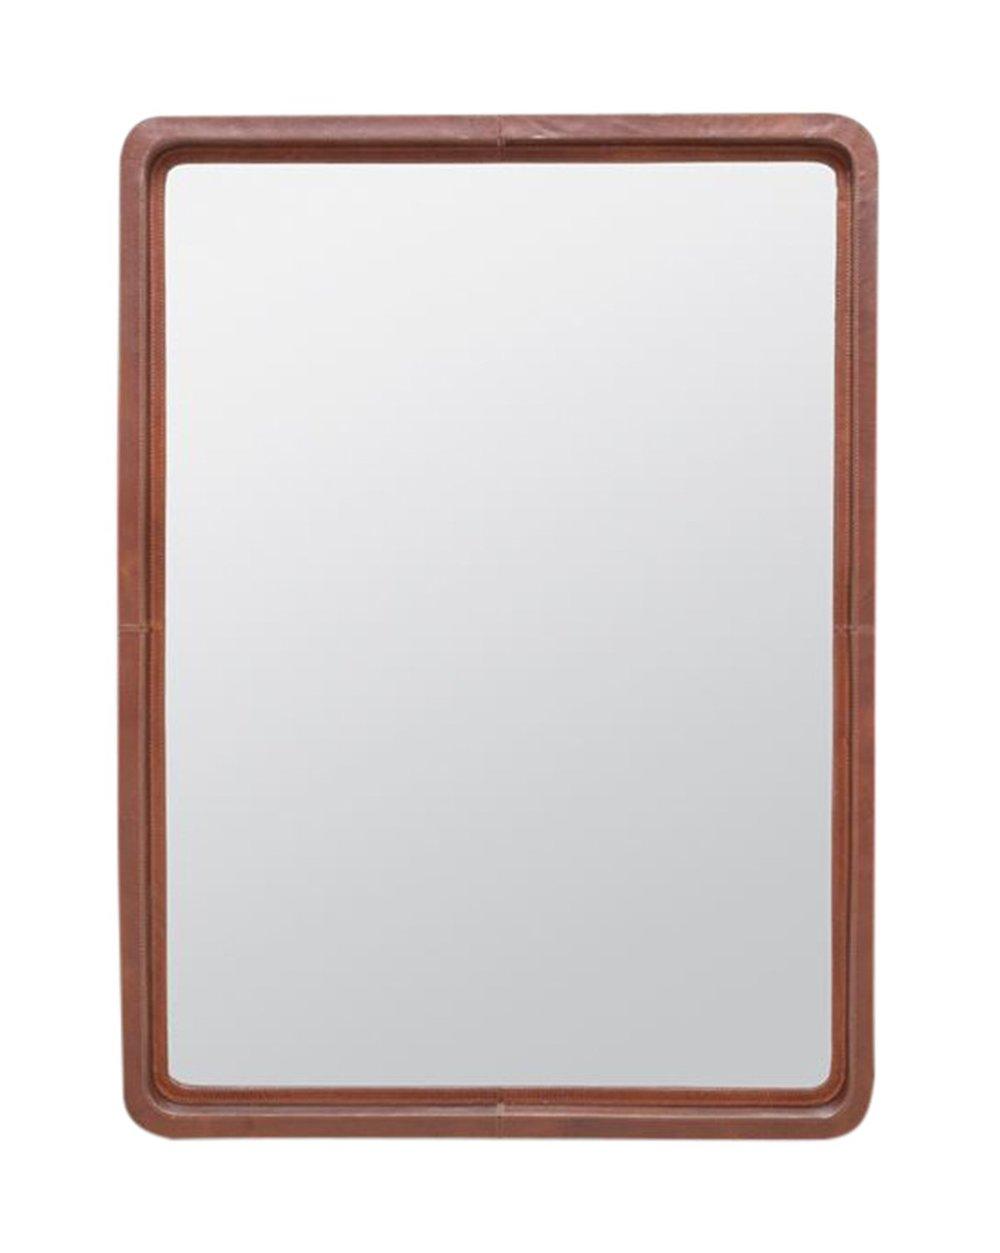 Franklin_Mirror_1.jpg